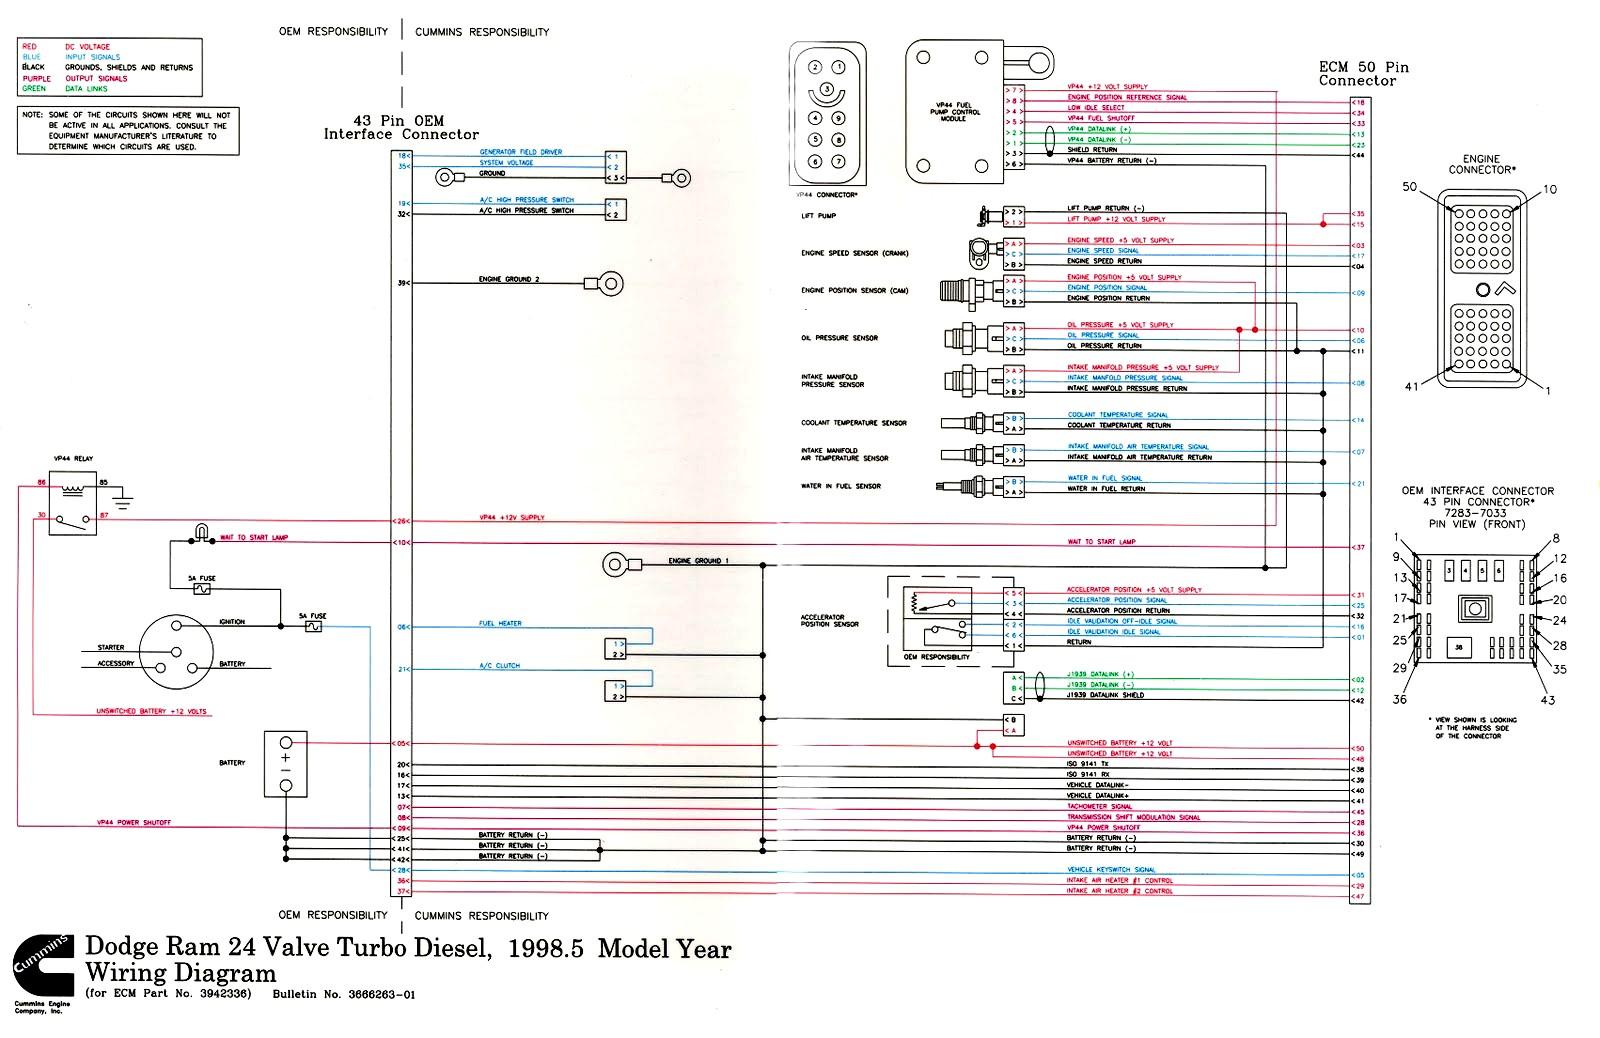 medium resolution of m11 wiring diagram wiring diagram schema m11 celect wiring diagram m11 wiring diagram